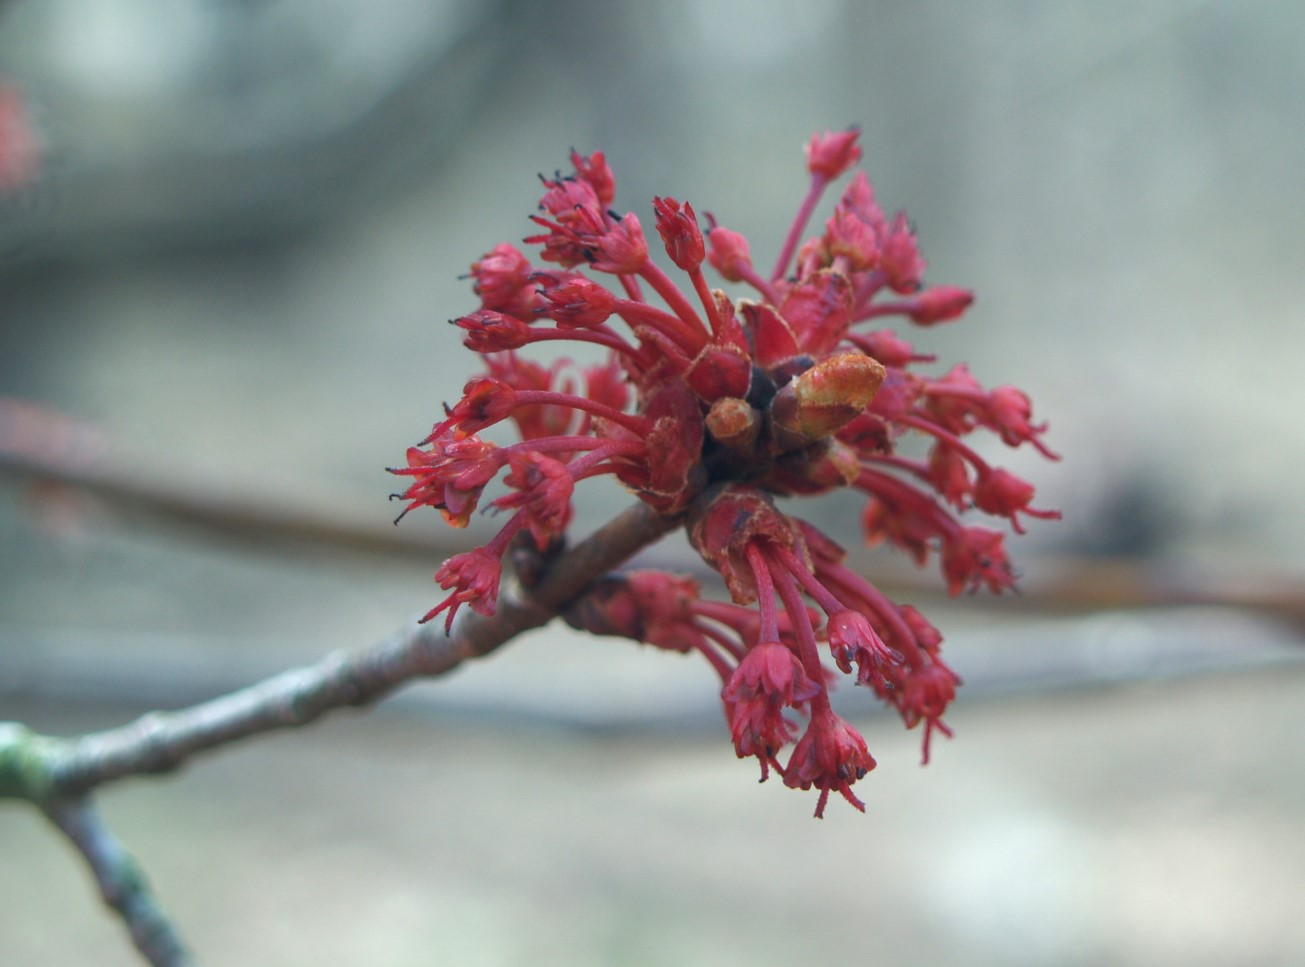 Blooming Brief April 20th